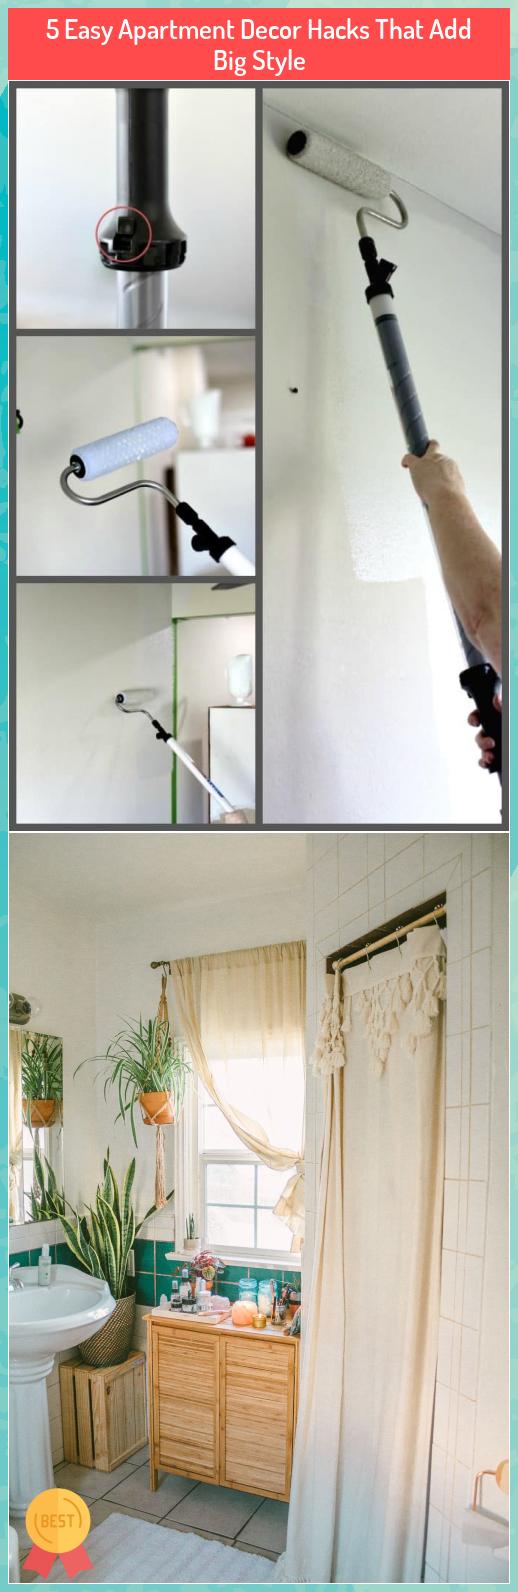 5 Easy Apartment Decor Hacks That Add Big Style #Easy #Apartment #Decor #Hacks #That #Add #Big #Style